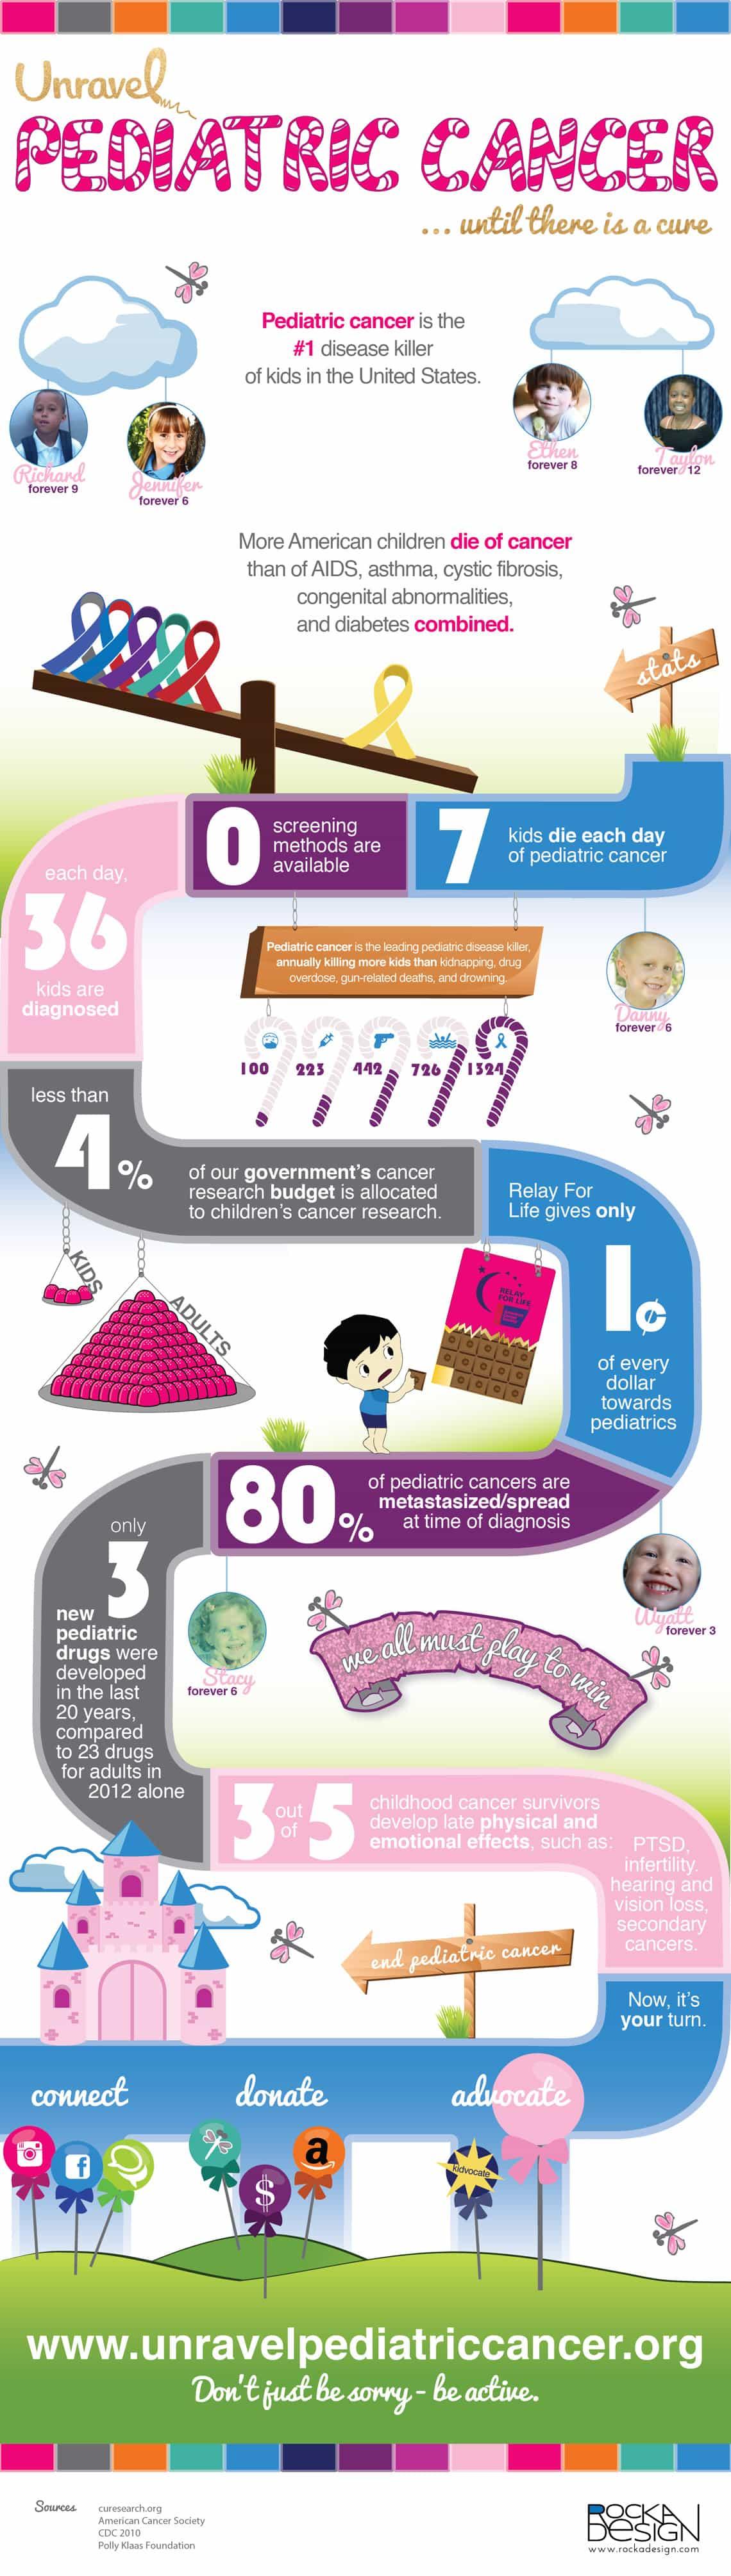 Unravel Pediatric Cancer